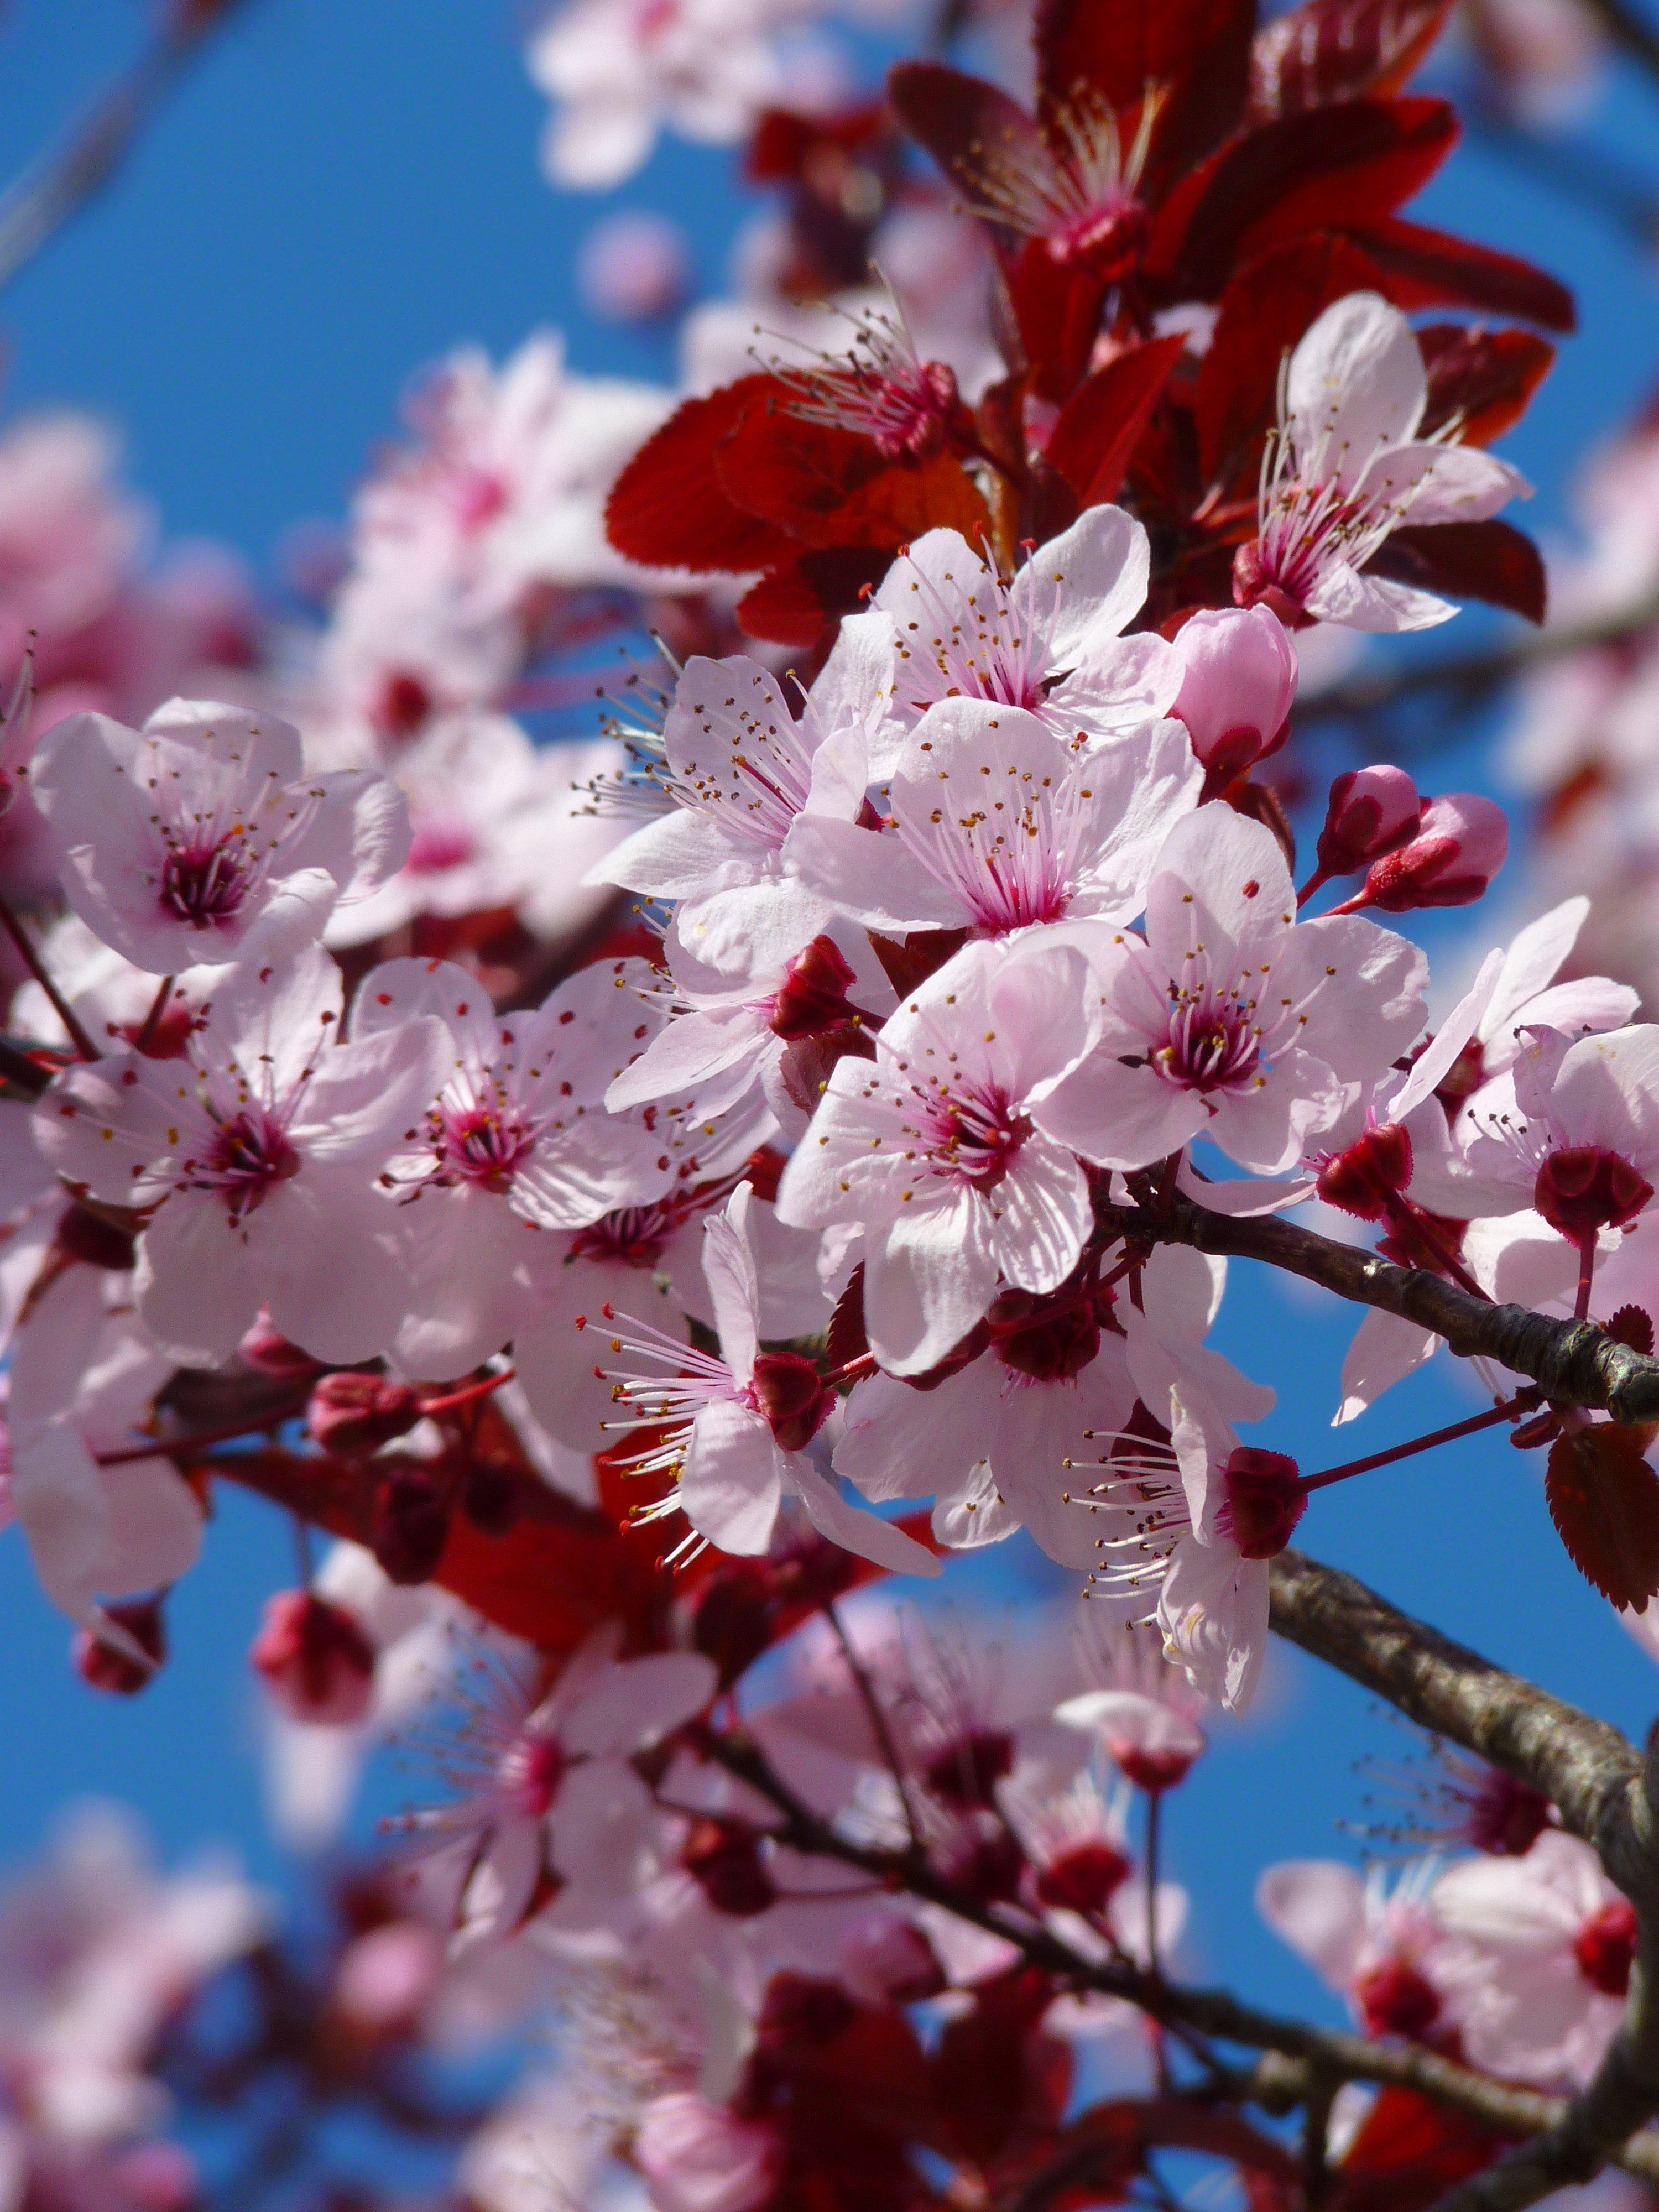 взрослого красивое цветущее дерево картинки светло-сизого окраса хвои